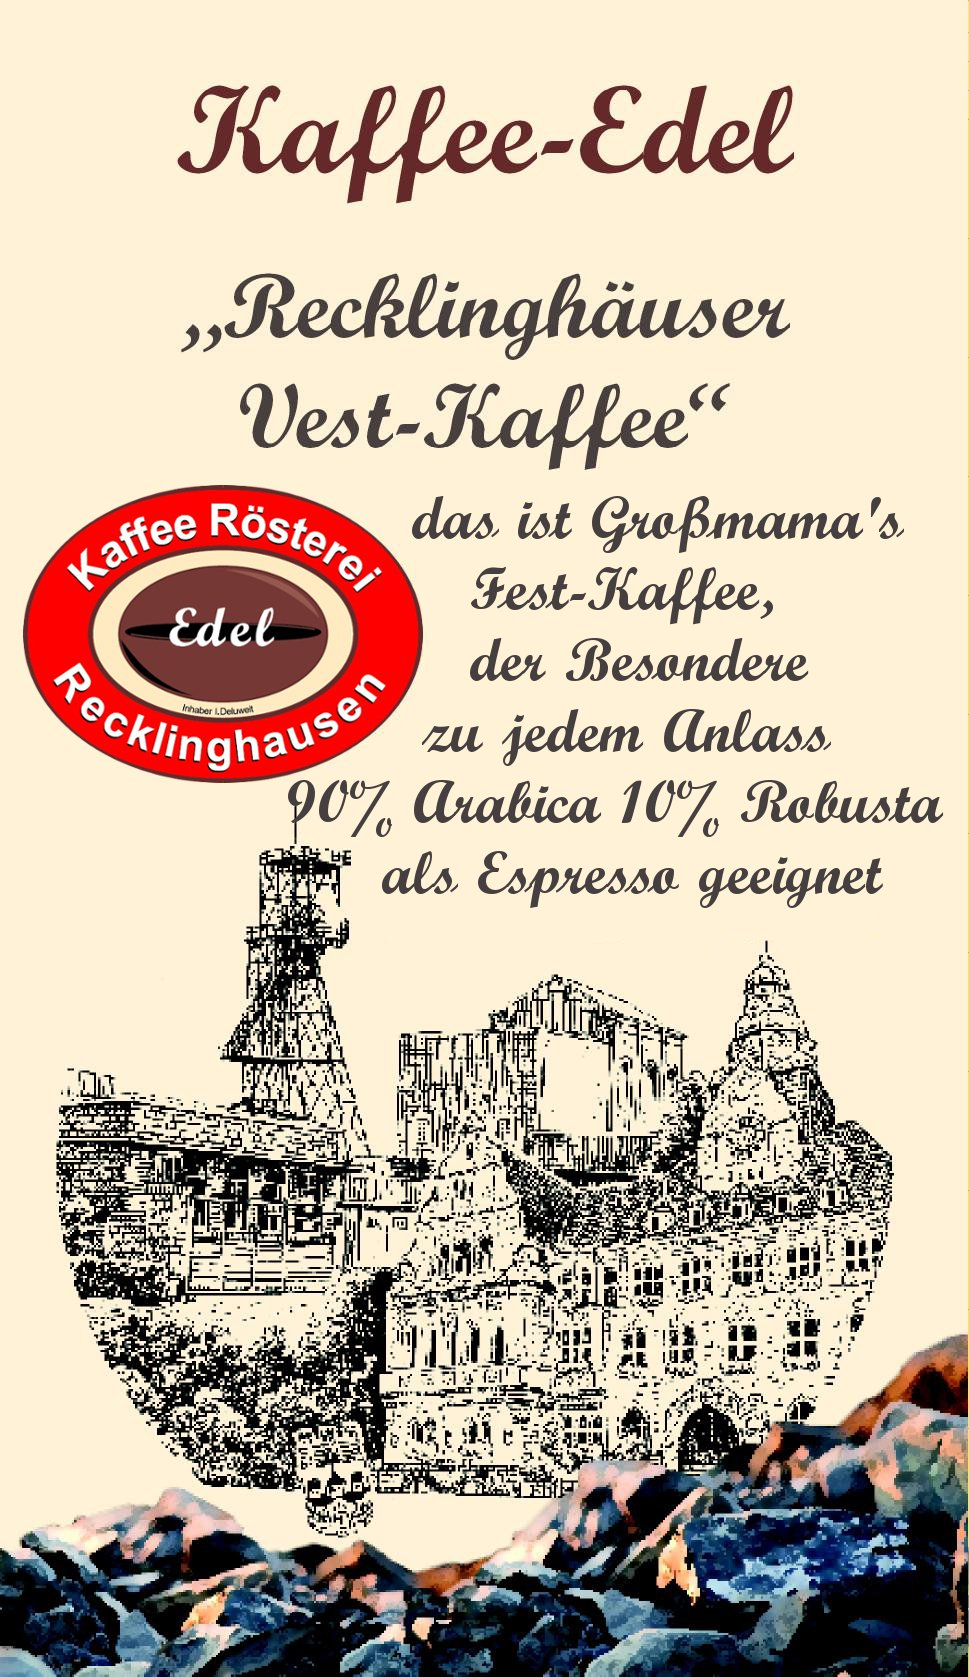 Espresso Recklinghausen kaffee rösterei edel ihre kaffeerösterei in recklinghausen